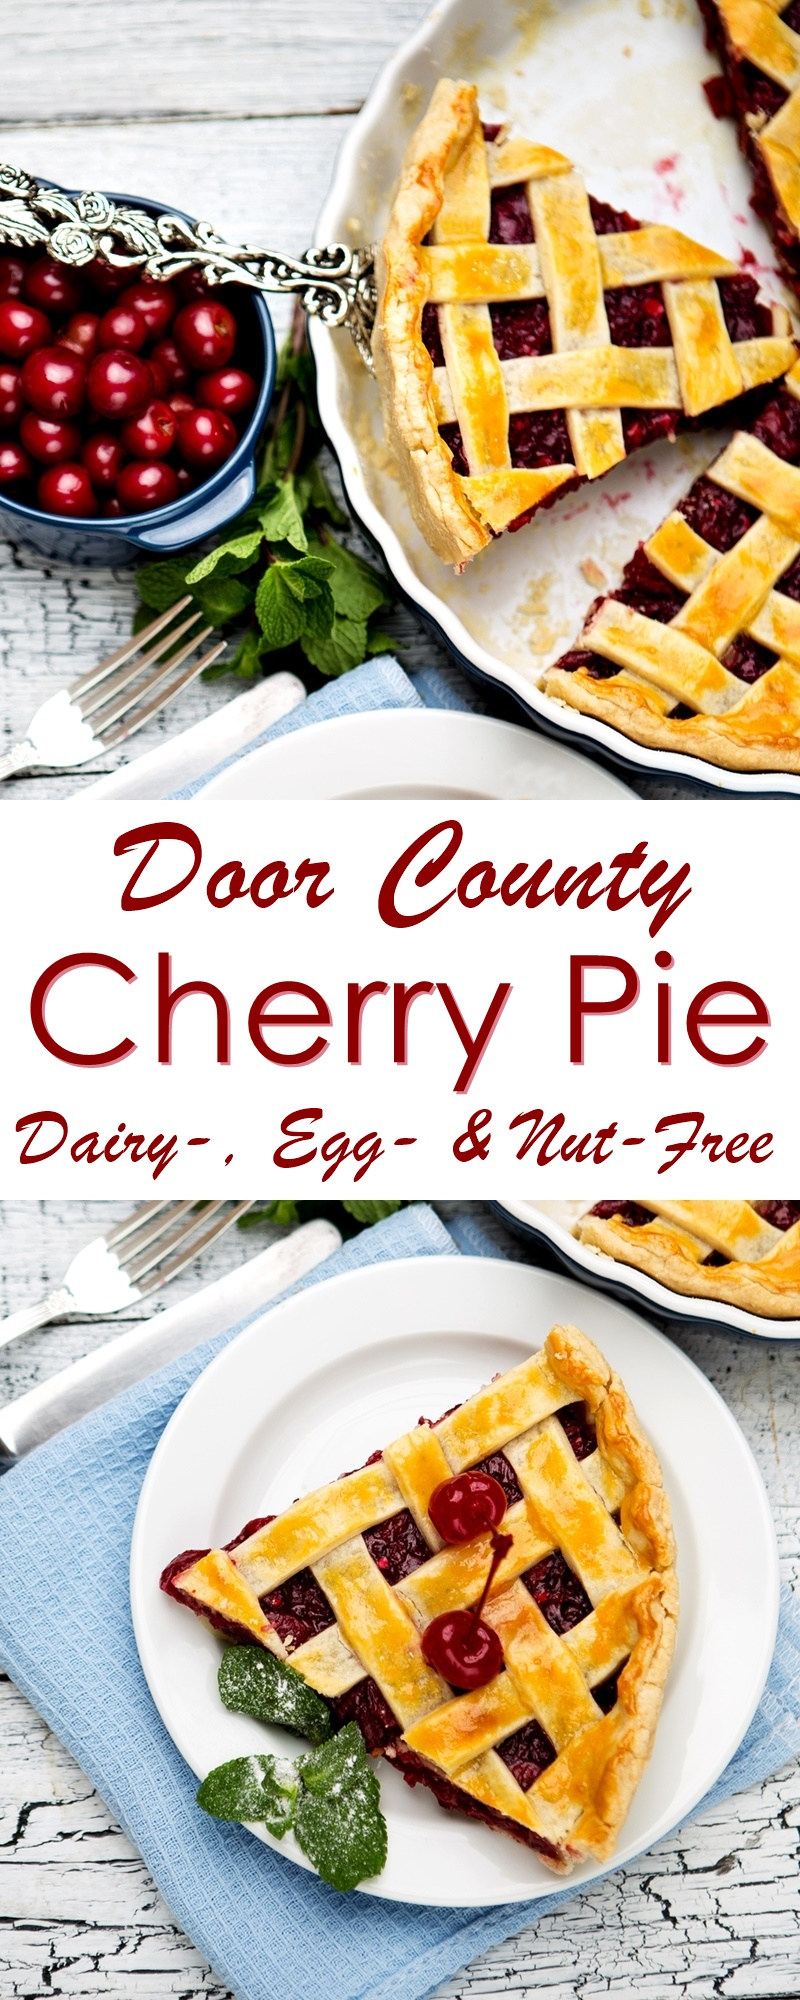 Door County Cherry Pie - dairy-free, egg-free, nut-free recipe with homemade vegan pie crust